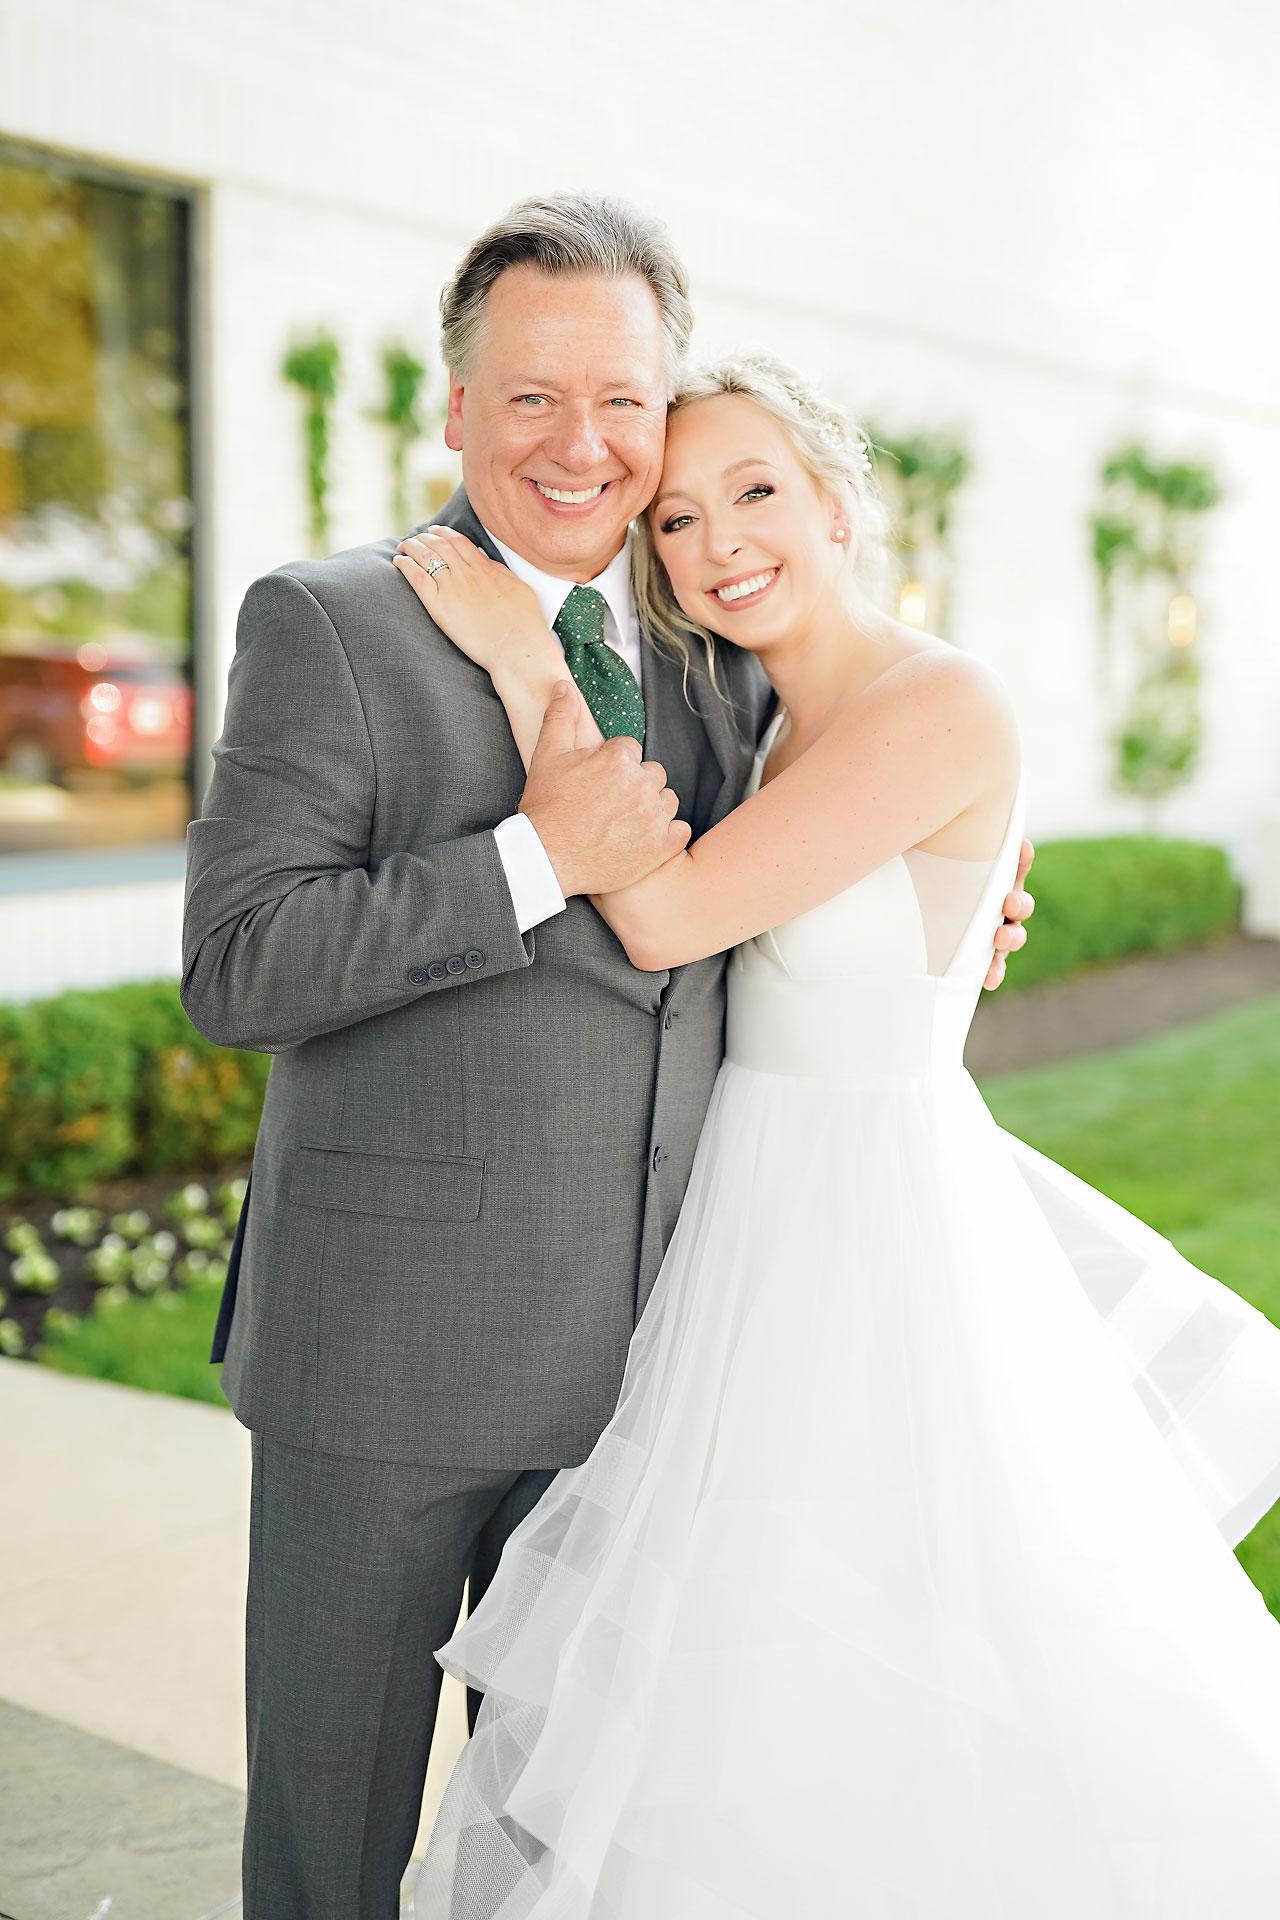 Brylie Jackson Ritz Charles Carmel Indiana Wedding Reception 029